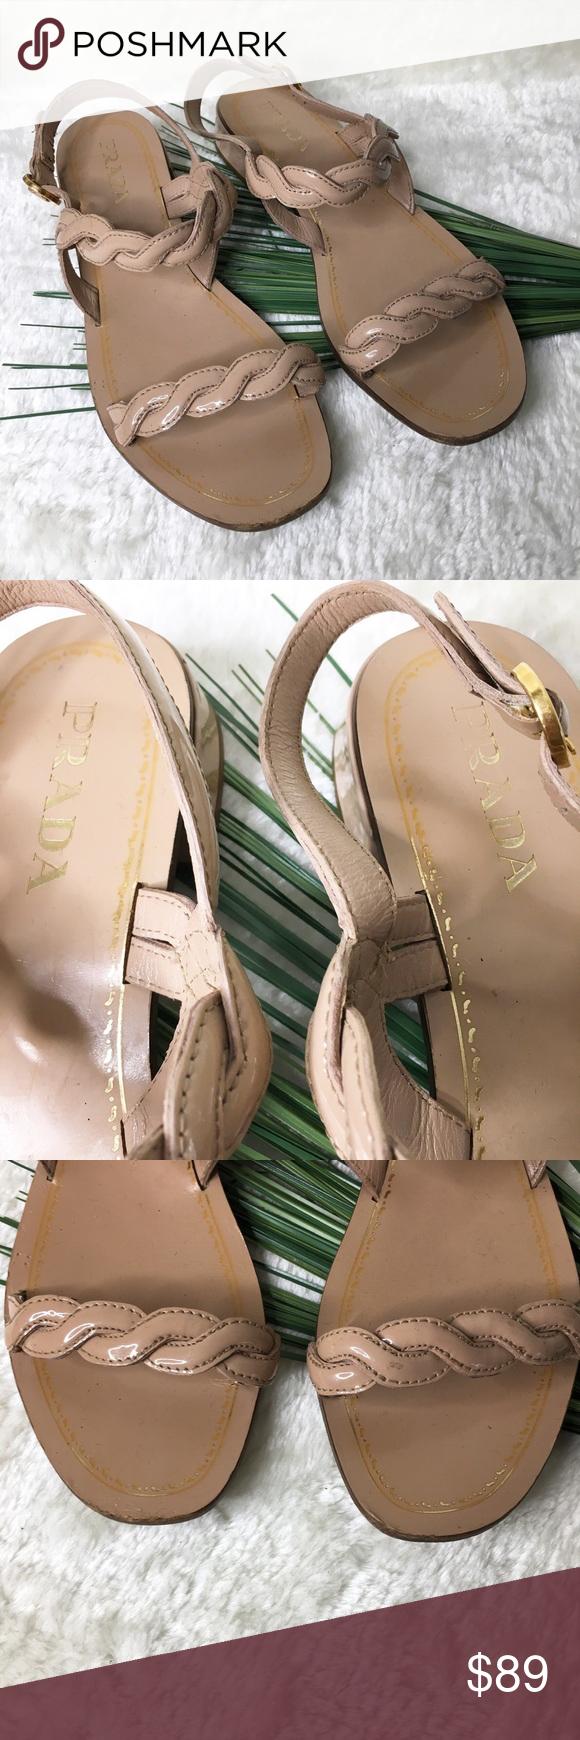 e0dbc5aae95ee0 Prada Blush Braided Patent Leather Sandals Size 10 Blush Prada Patent  Leather Braided T Strap Sandals